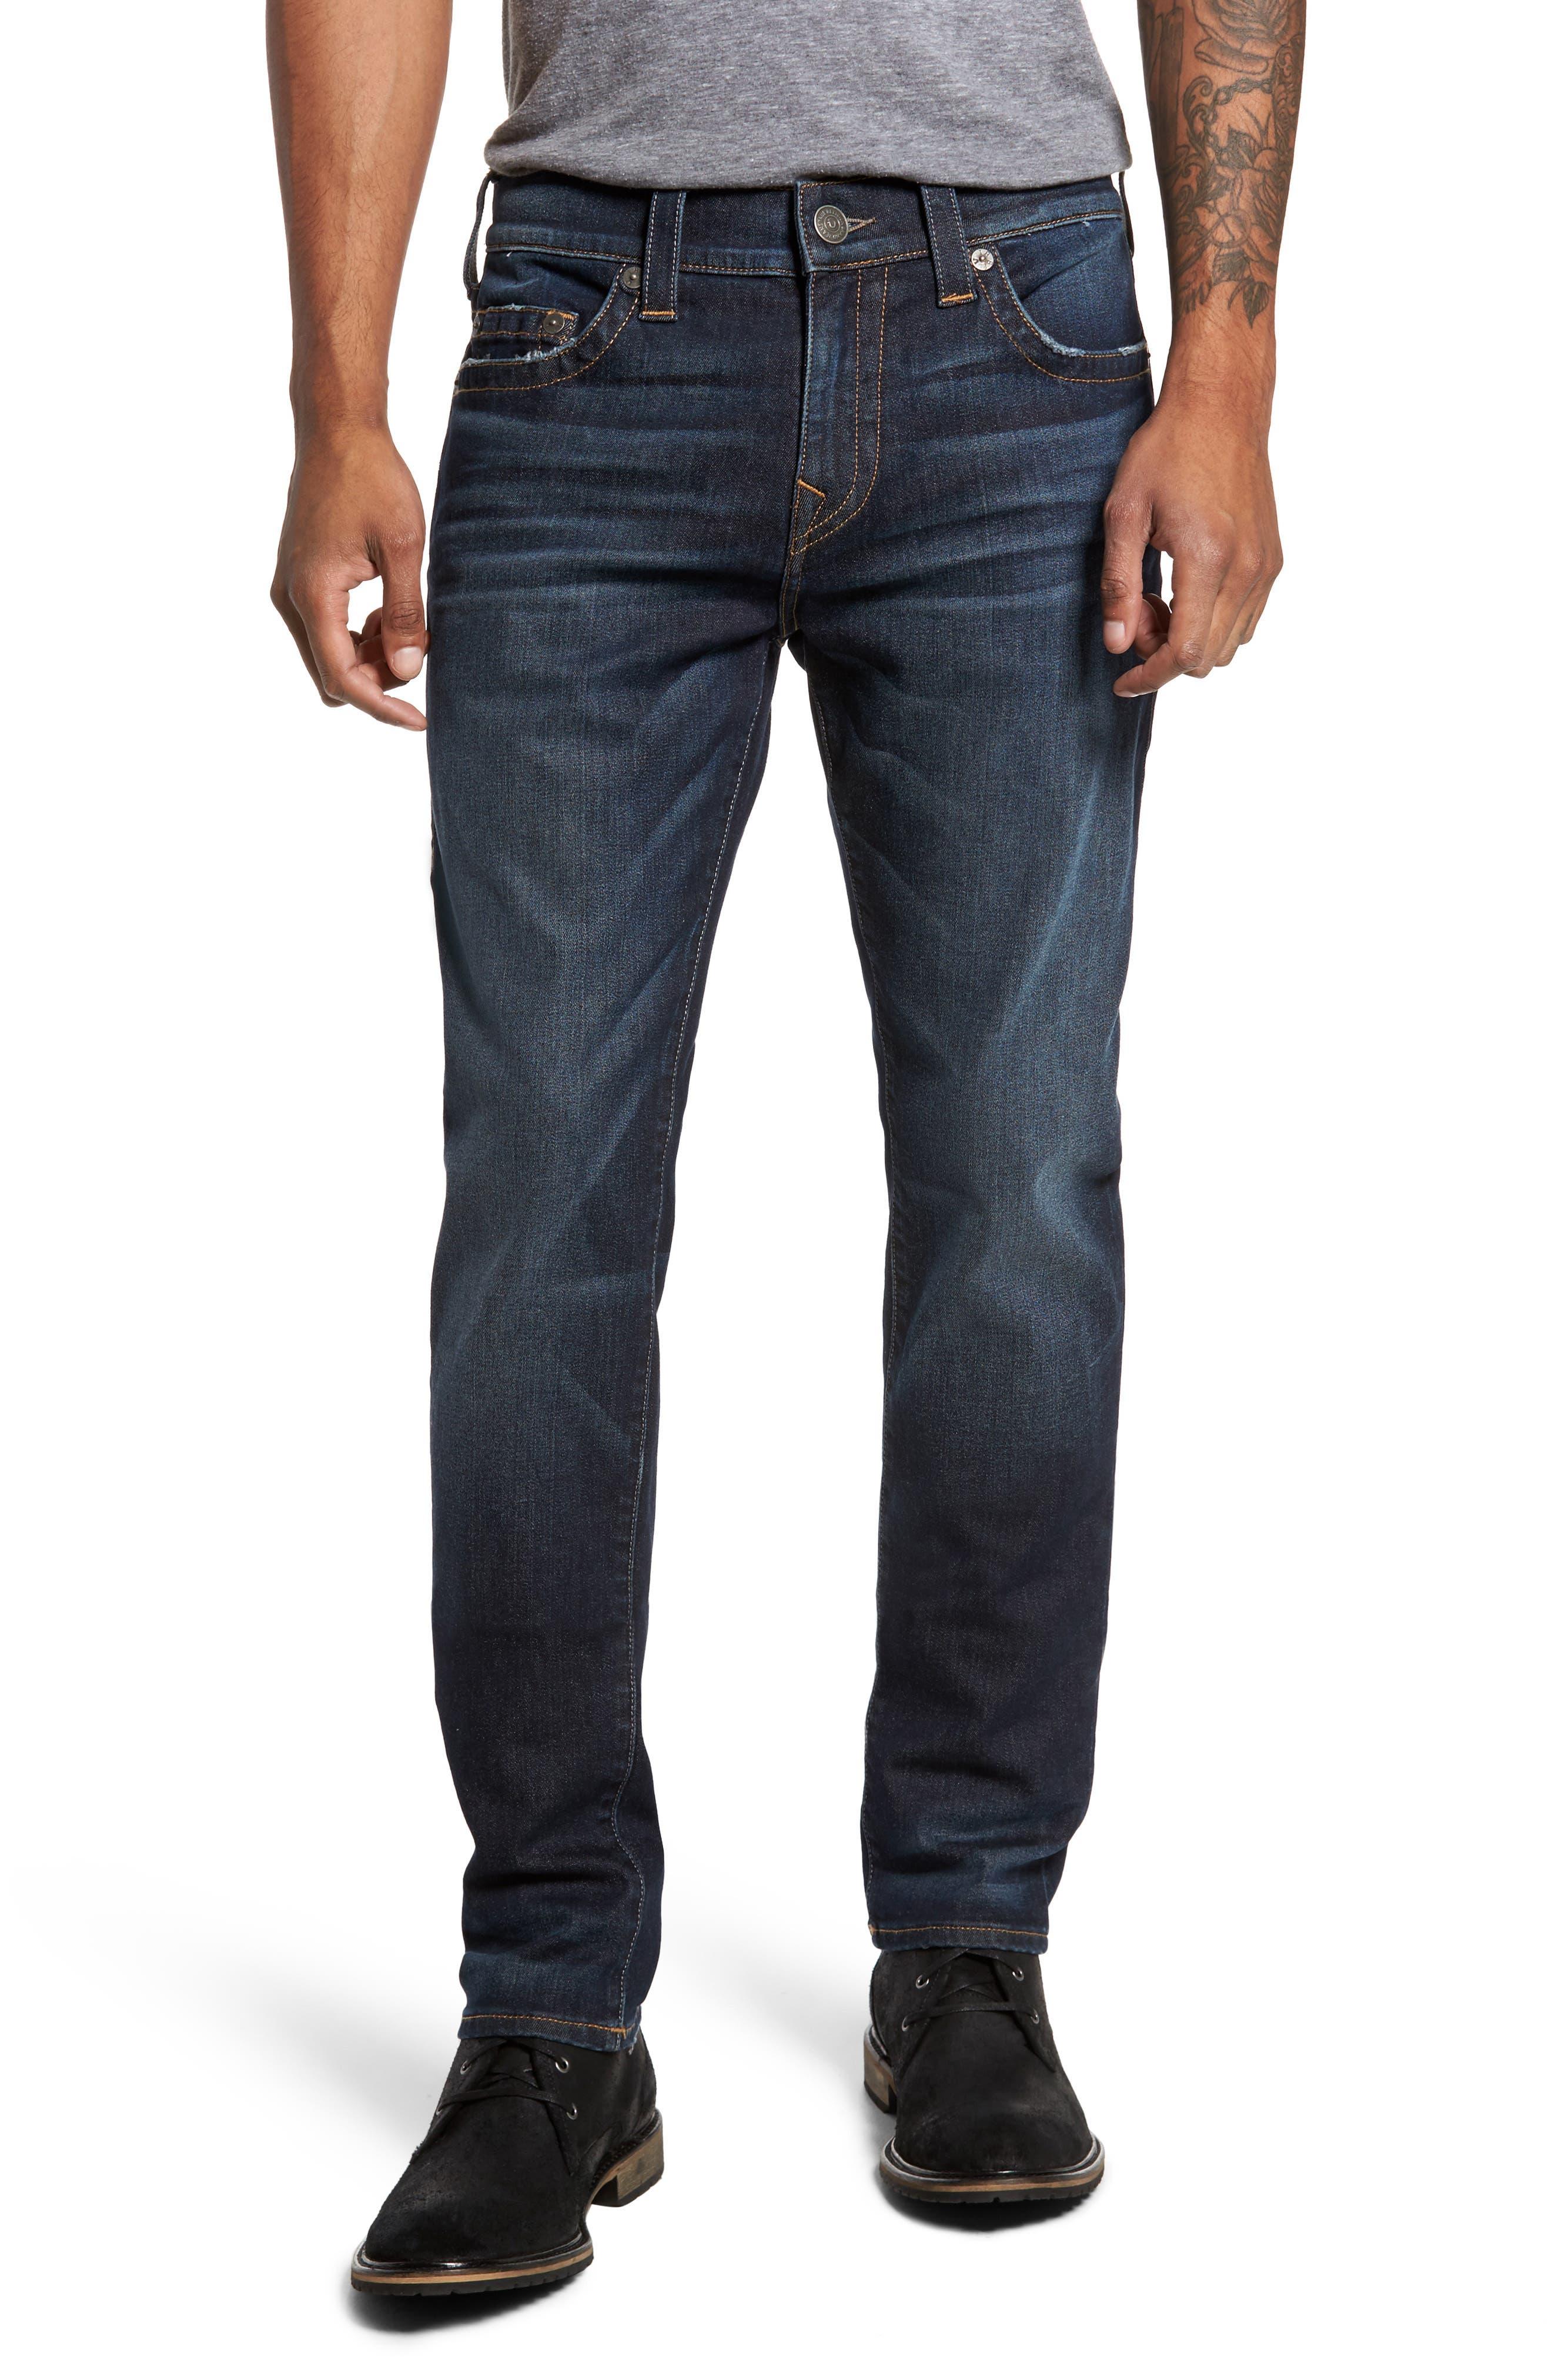 Rocco Skinny Fit Jeans,                         Main,                         color, Dark Indigo Luxe